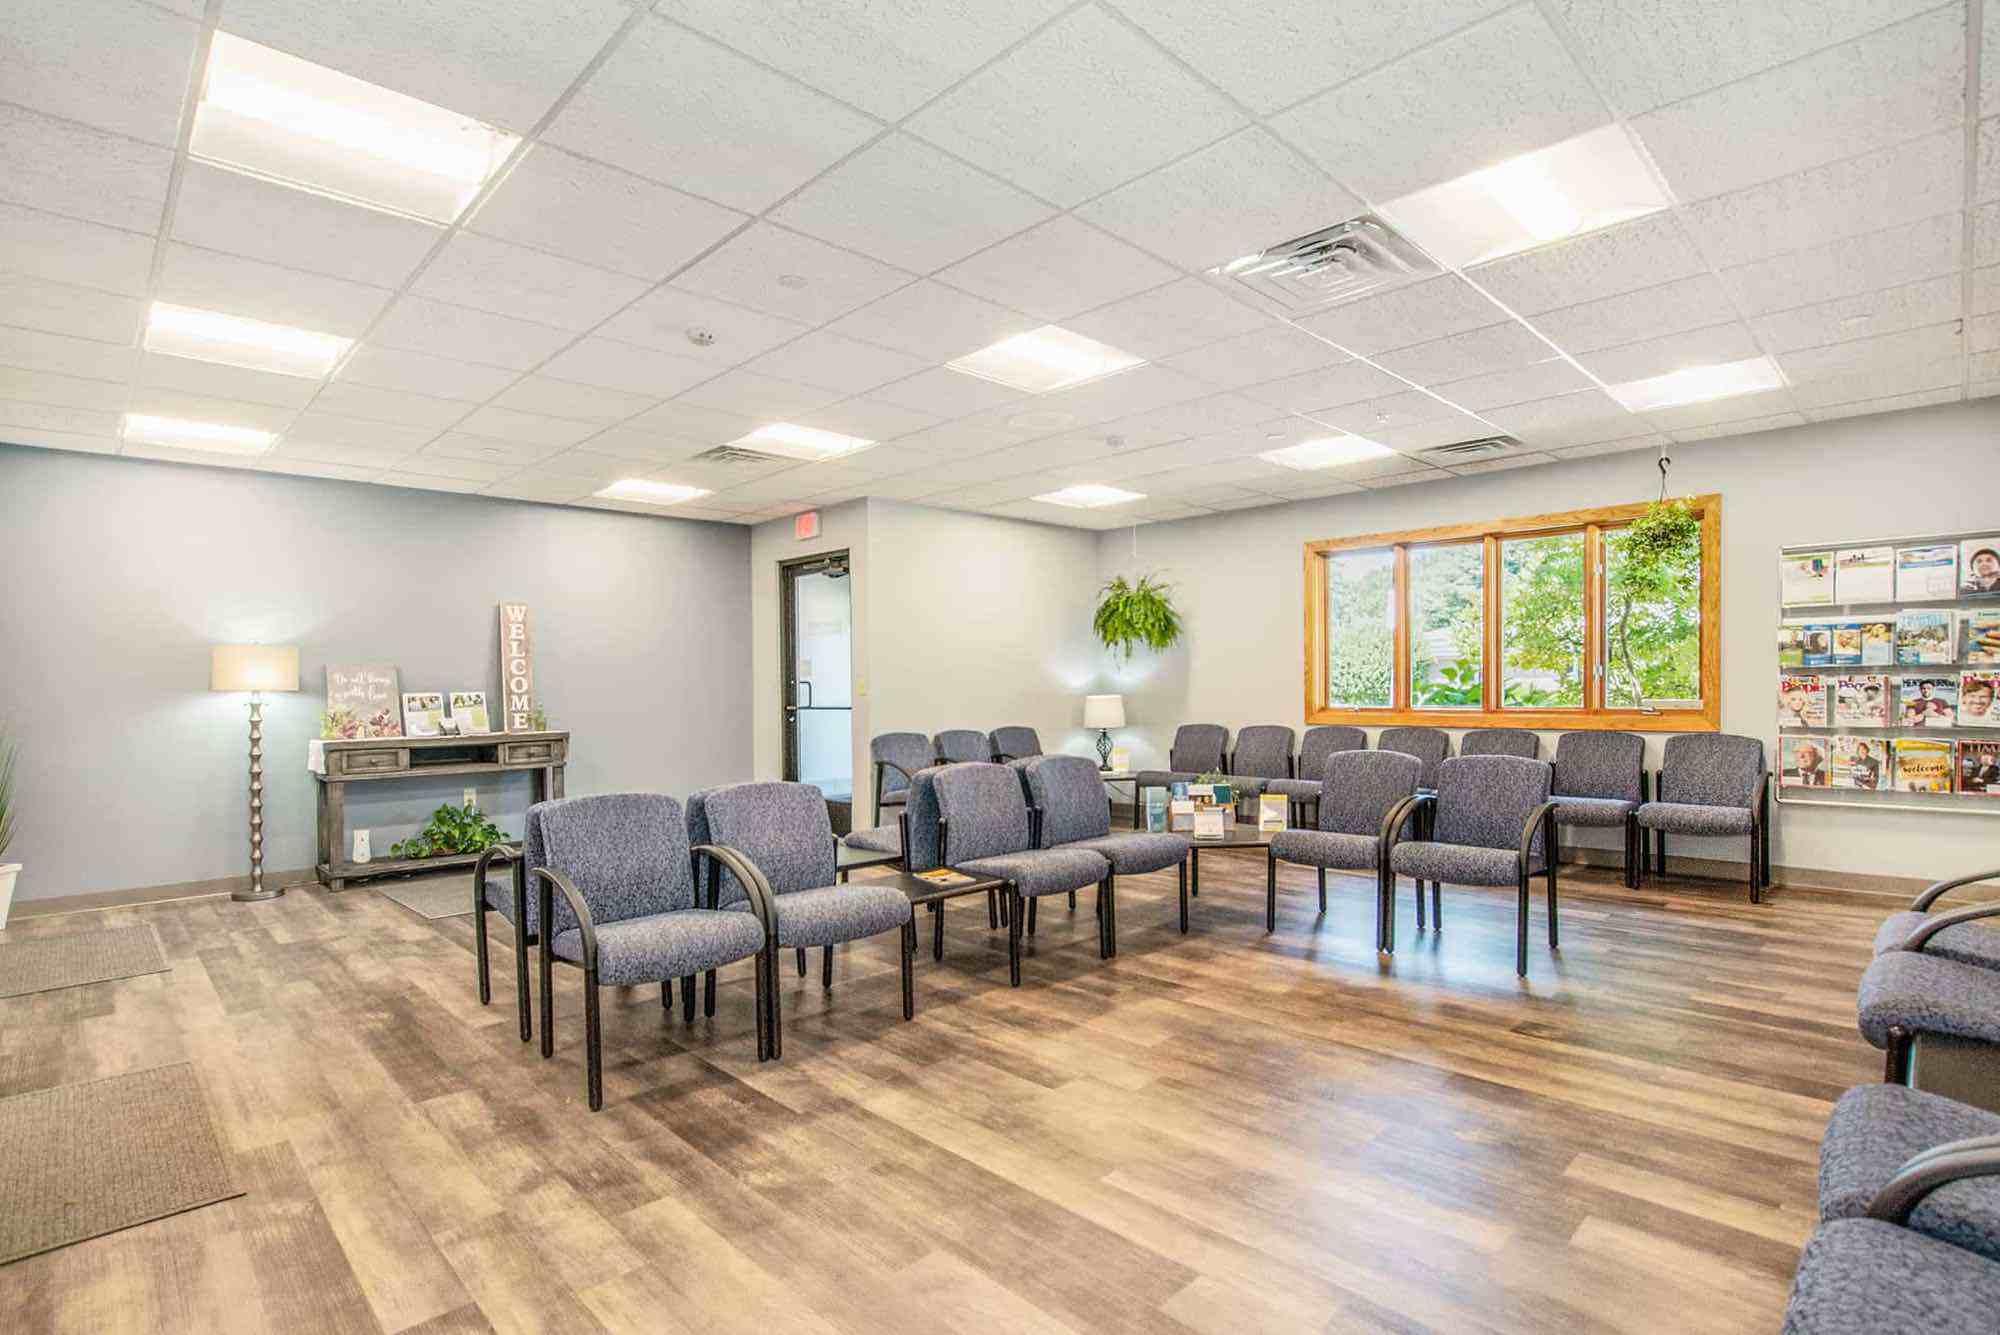 Holland Clinic Pine Rest Christian Mental Health Services Grand Rapids Mi